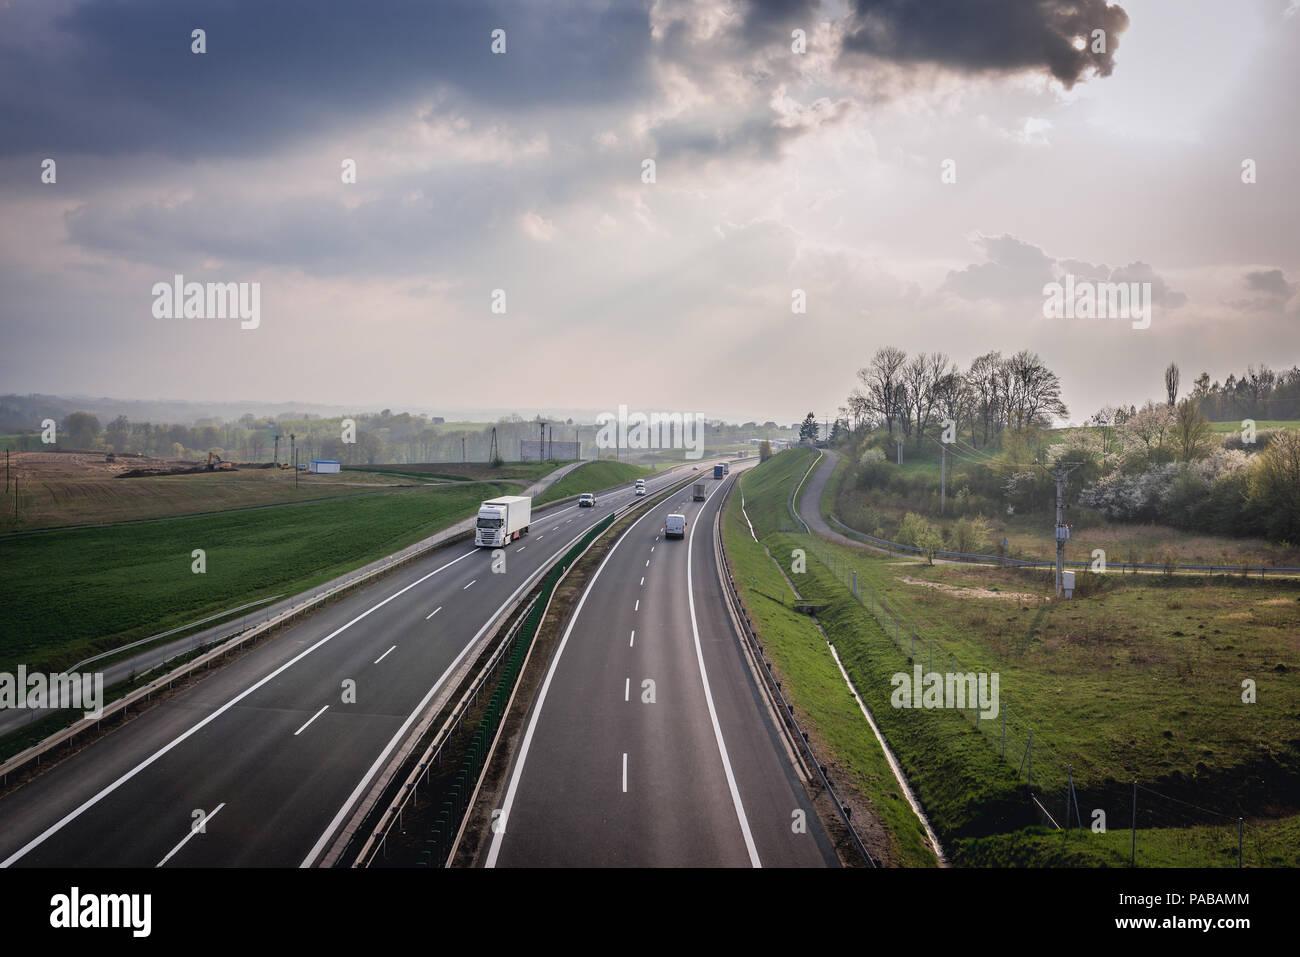 Expressway S52 near Bielsko-Biala city in Silesian Voivodeship of Poland - Stock Image